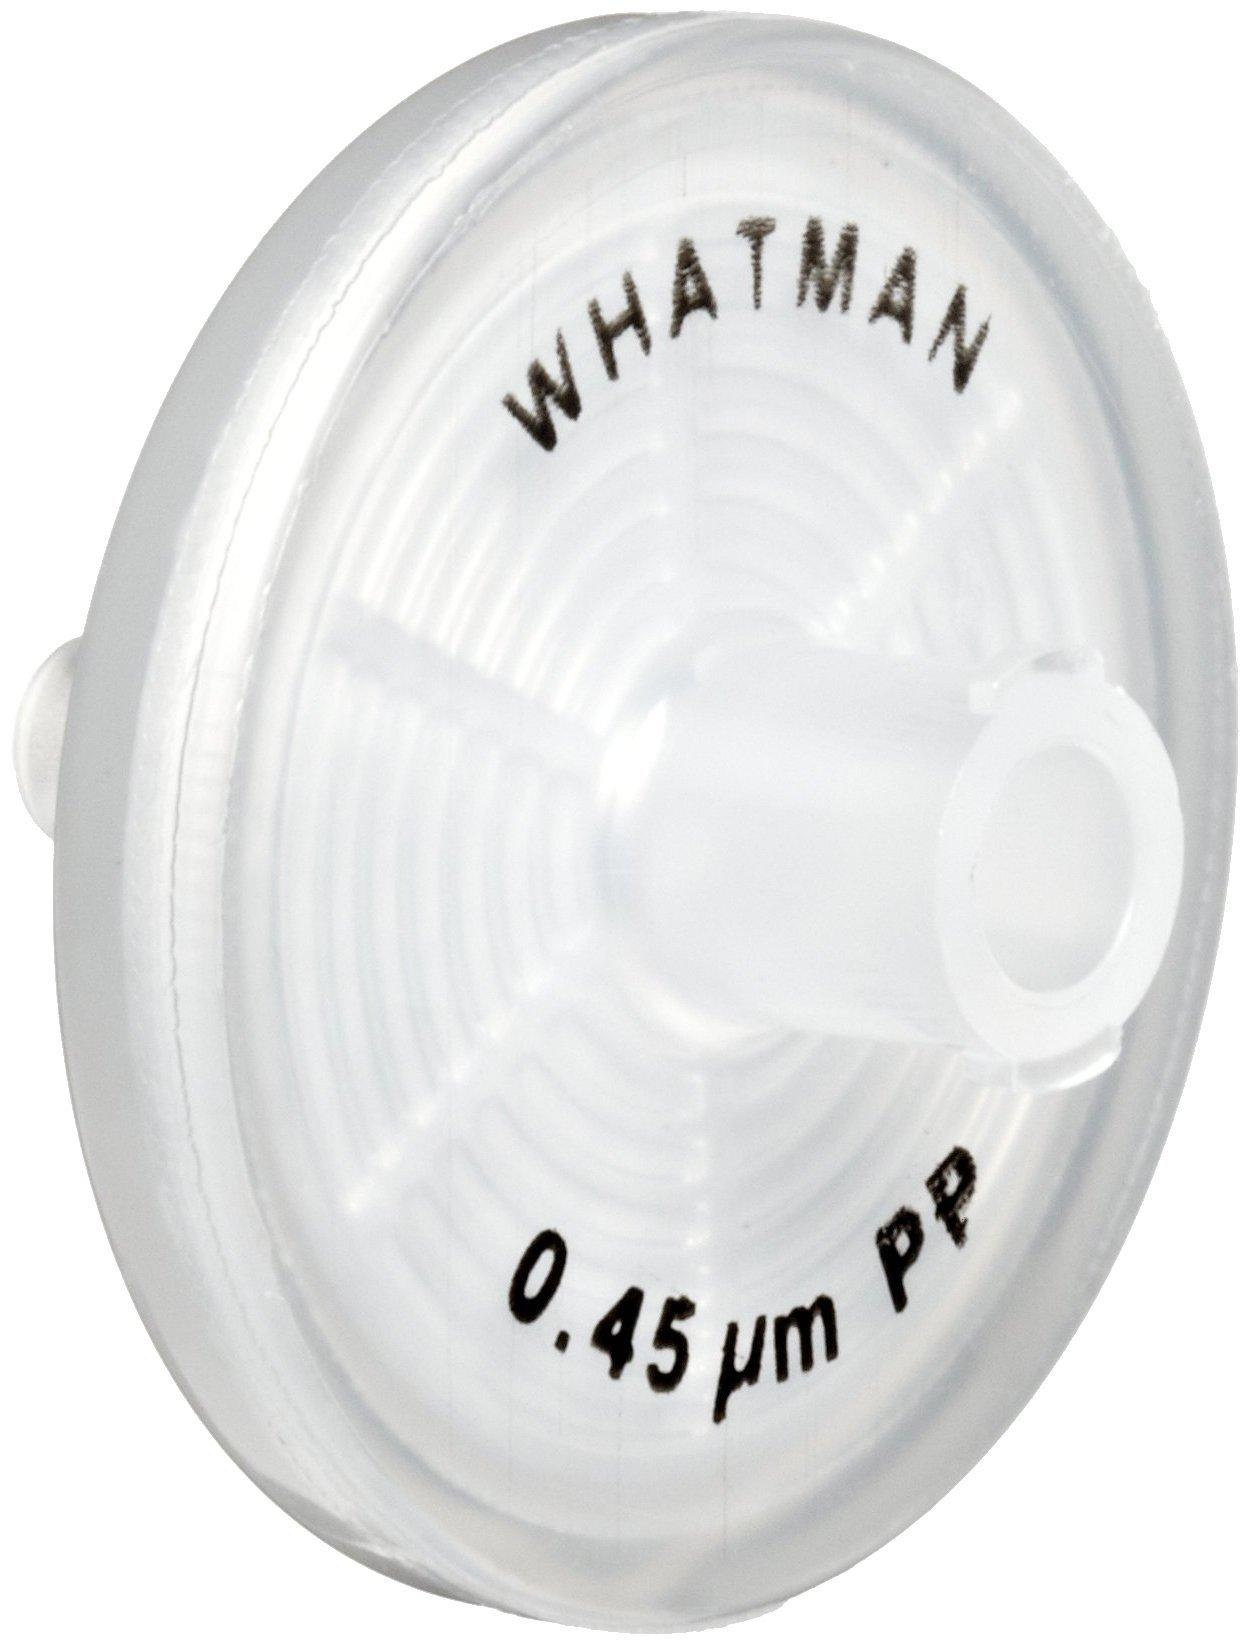 Whatman 6786-2504 depth Polypropylene Puradisc 25 Syringe Filter, 0.45 Micron (Pack of 50)